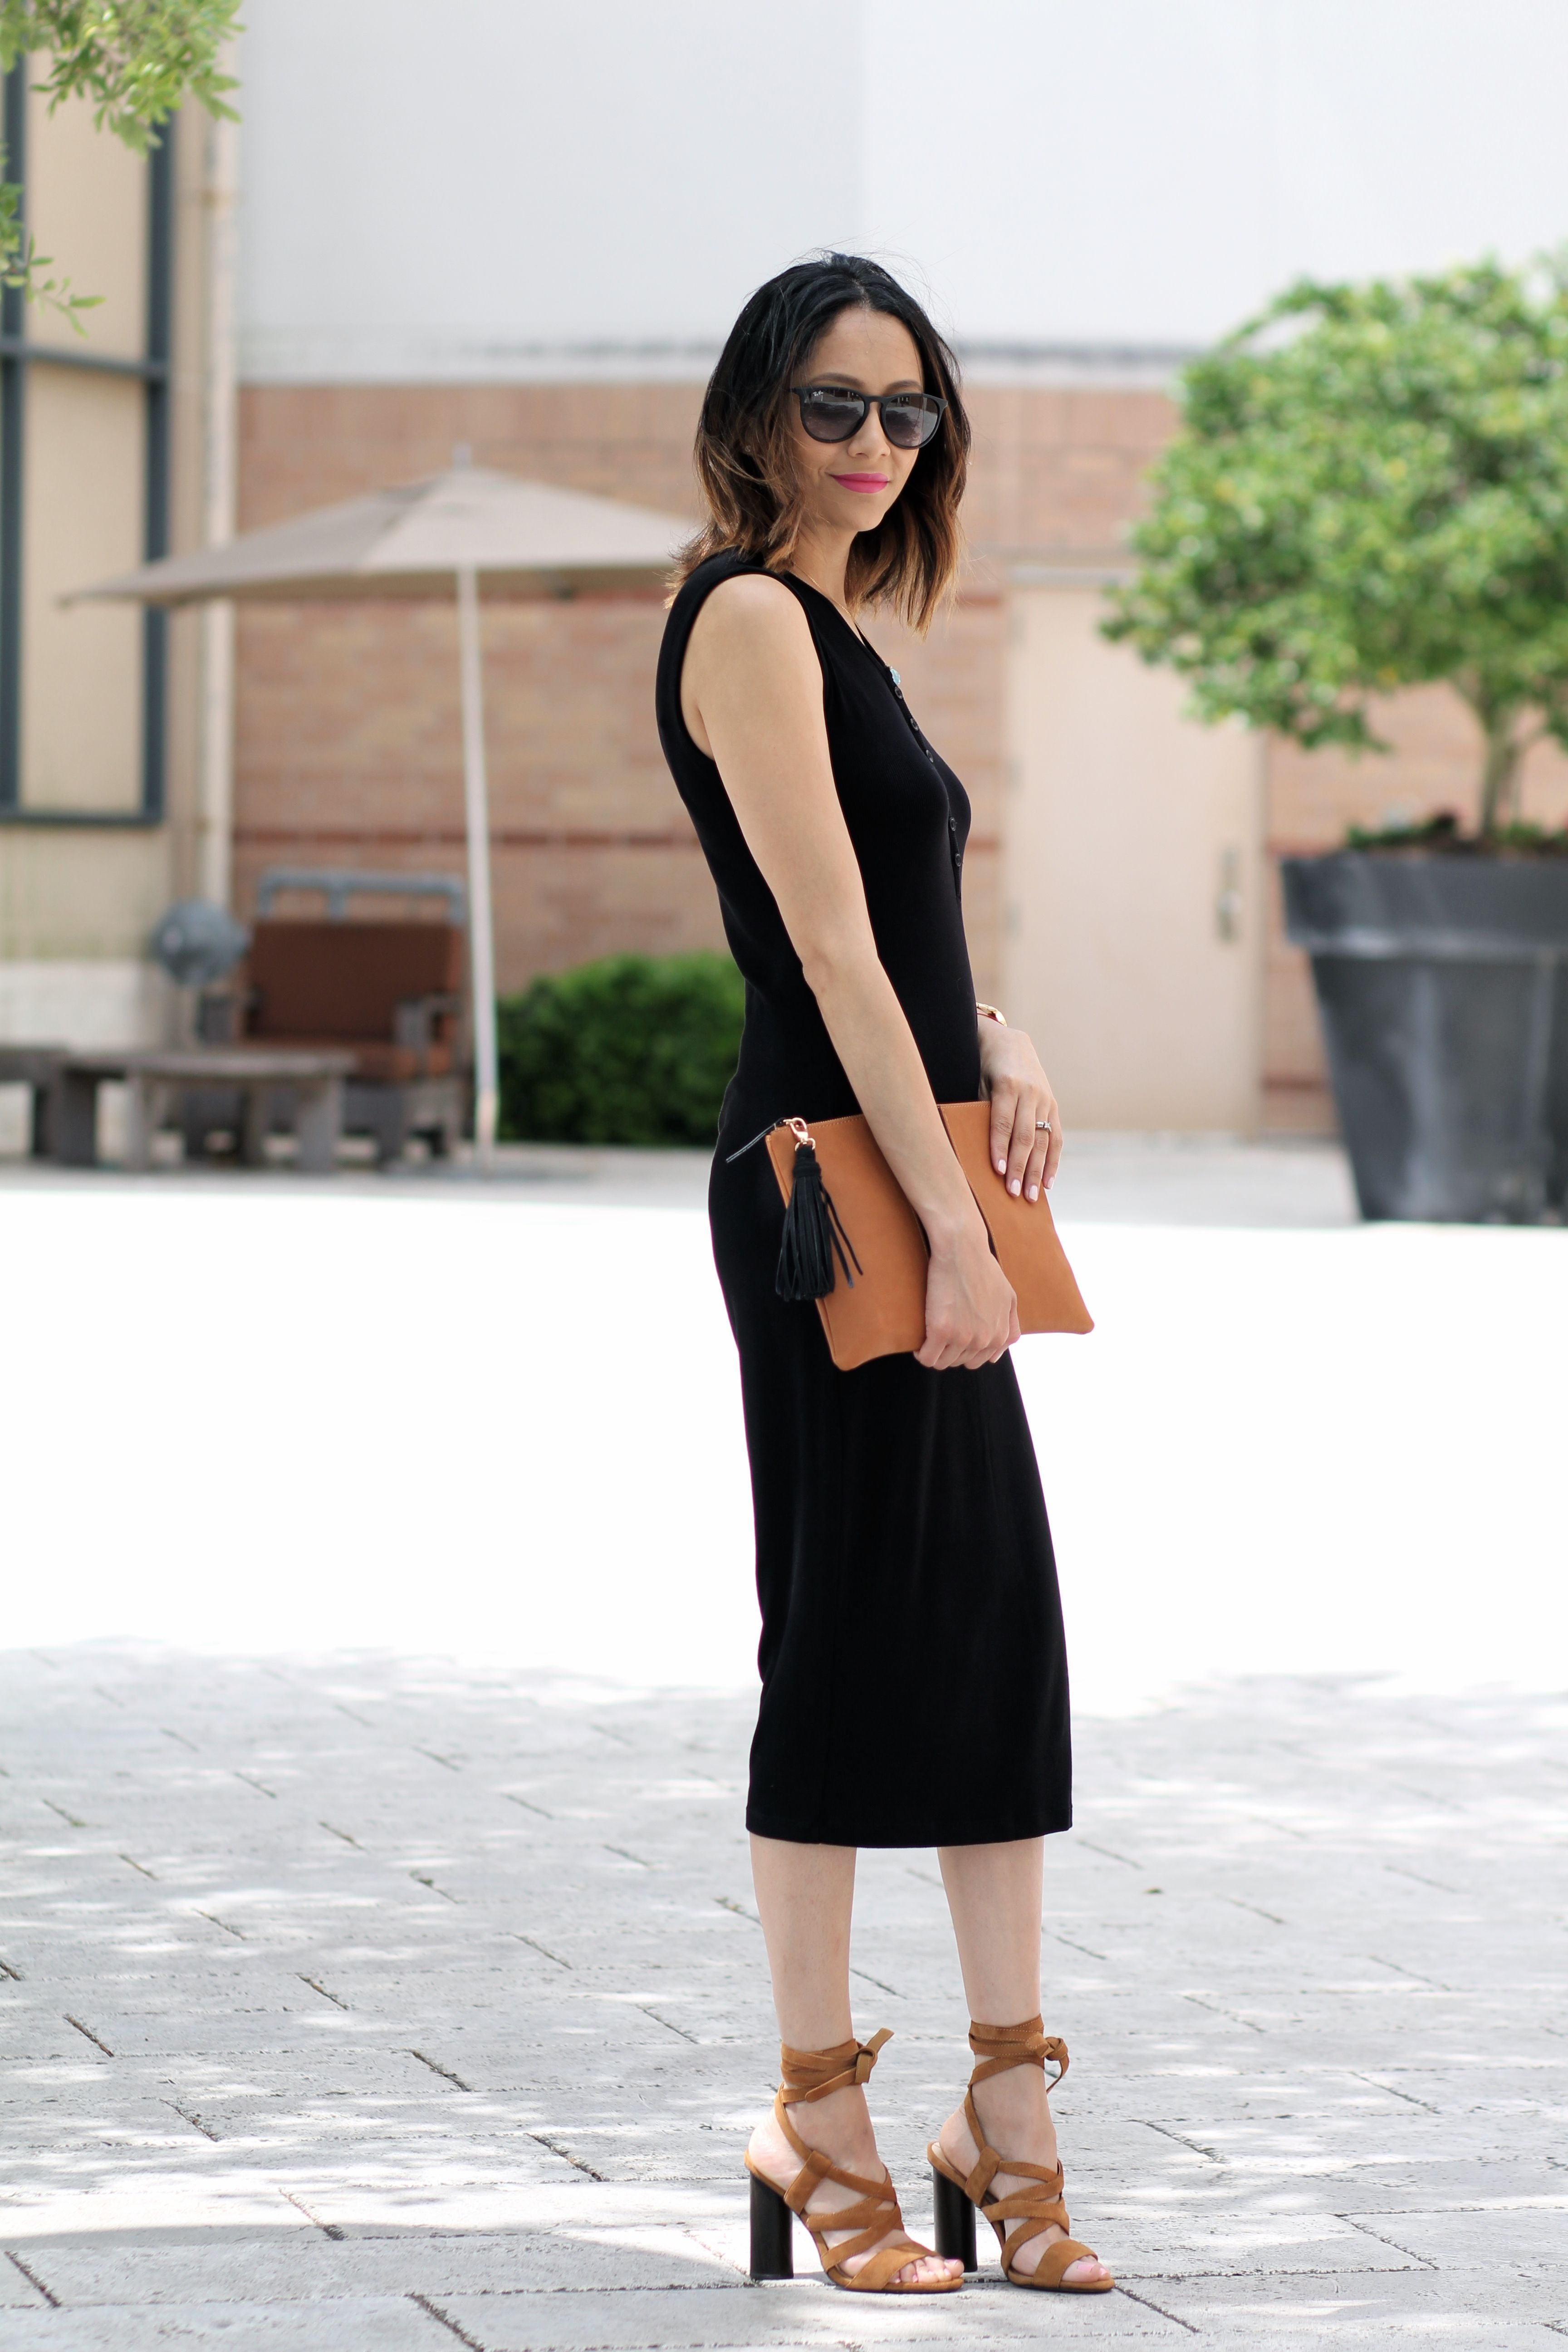 Daily Craving Houston Style Blogger Houston Fashion Fashion Blogger Style [ 5184 x 3456 Pixel ]